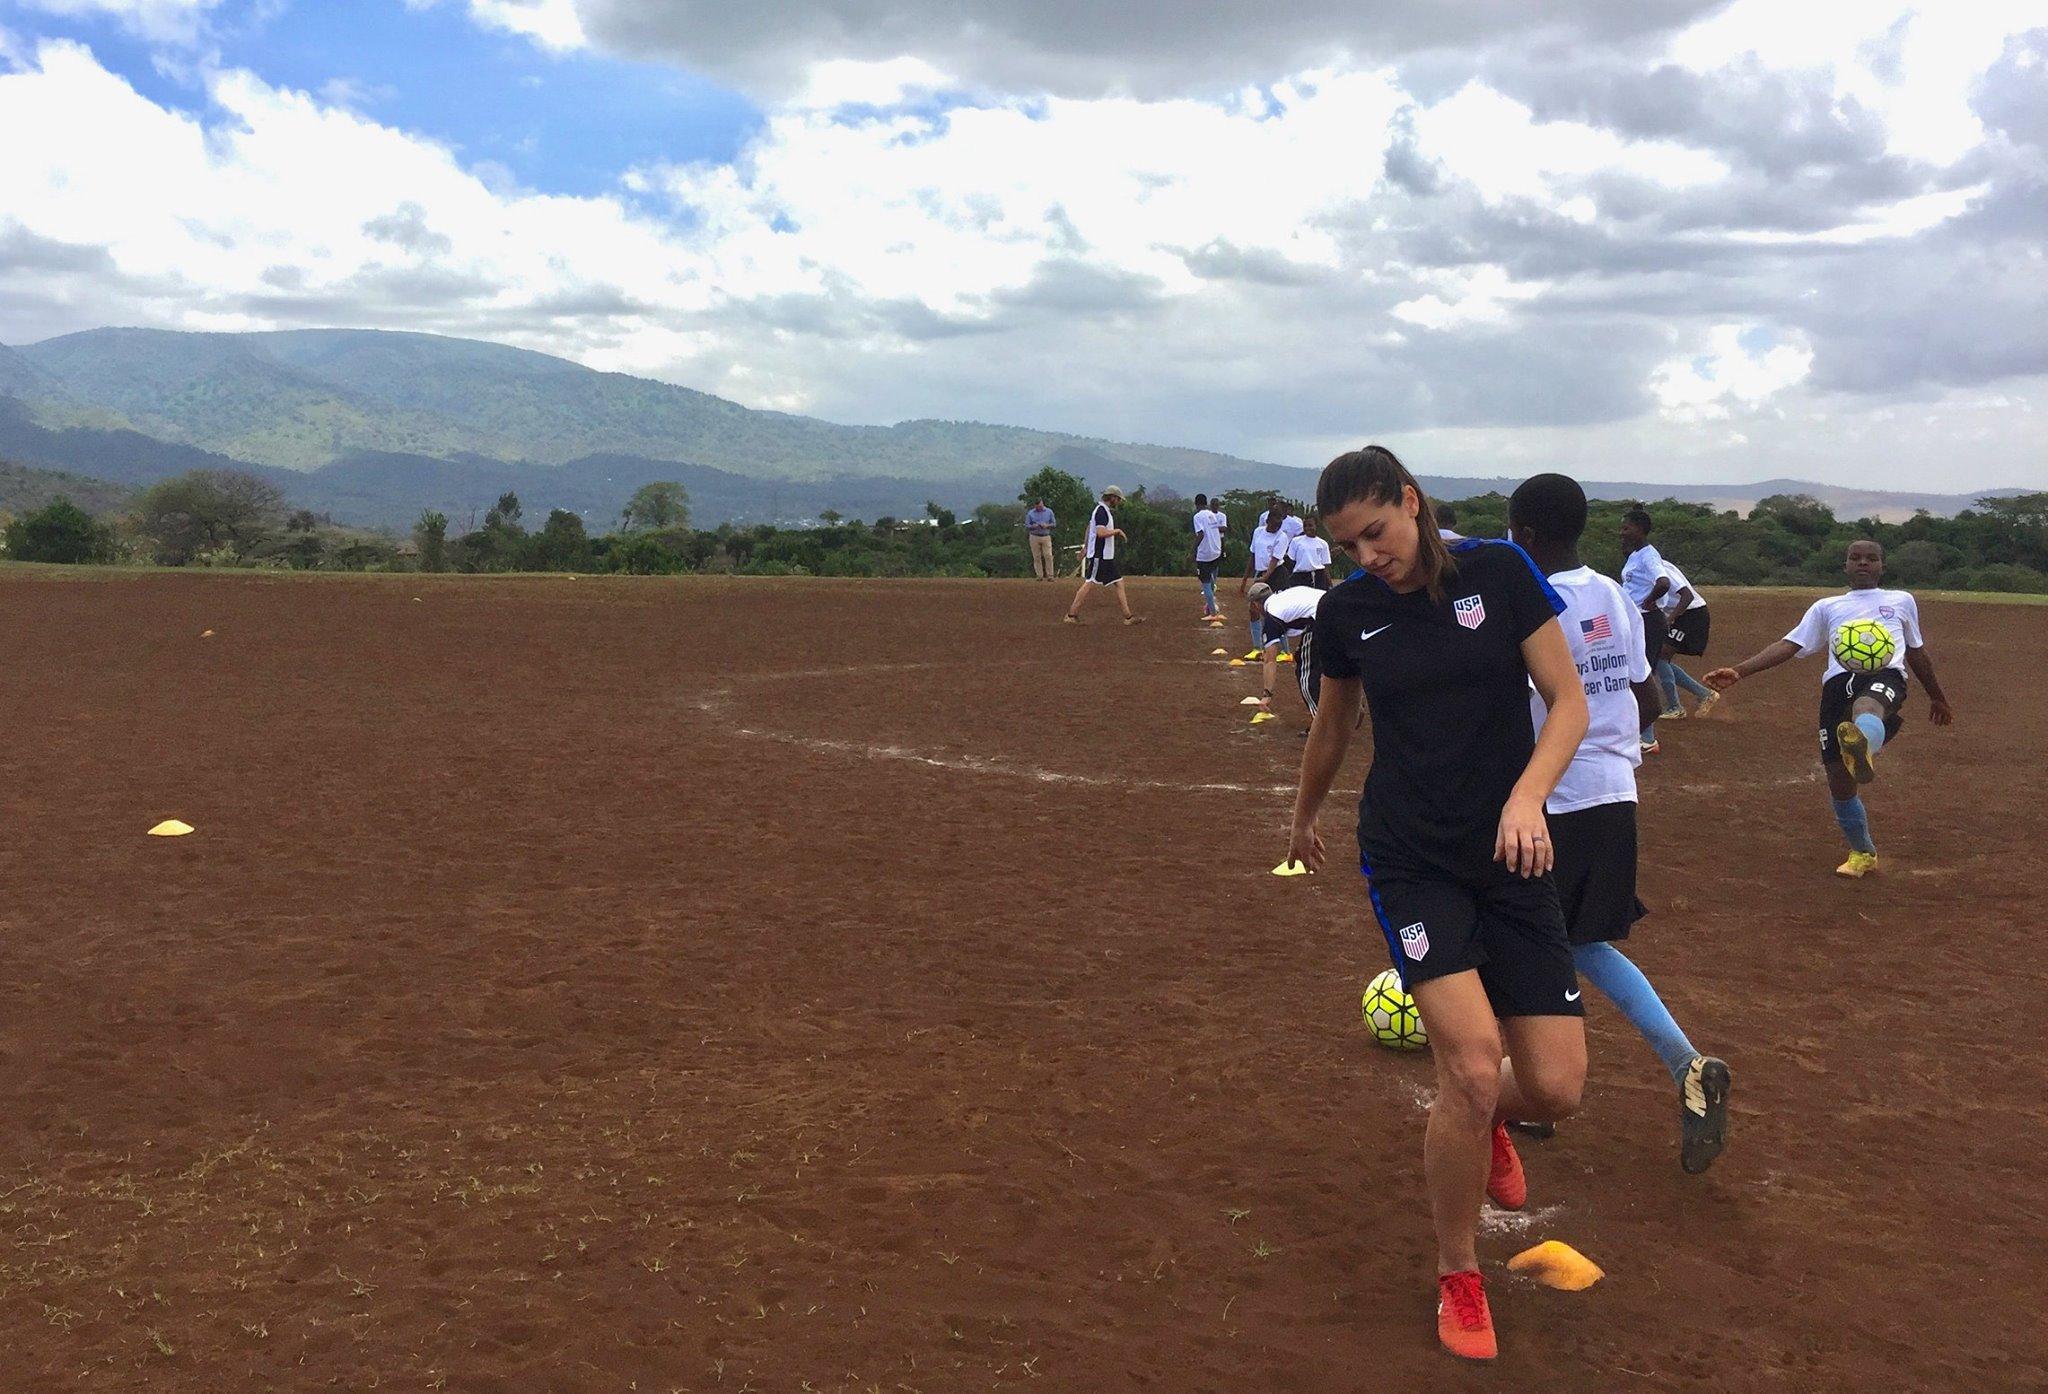 Sports Envoys and U.S. Women's National Team member, Alex Morgan leads soccer drills in Tanzania. 2017.